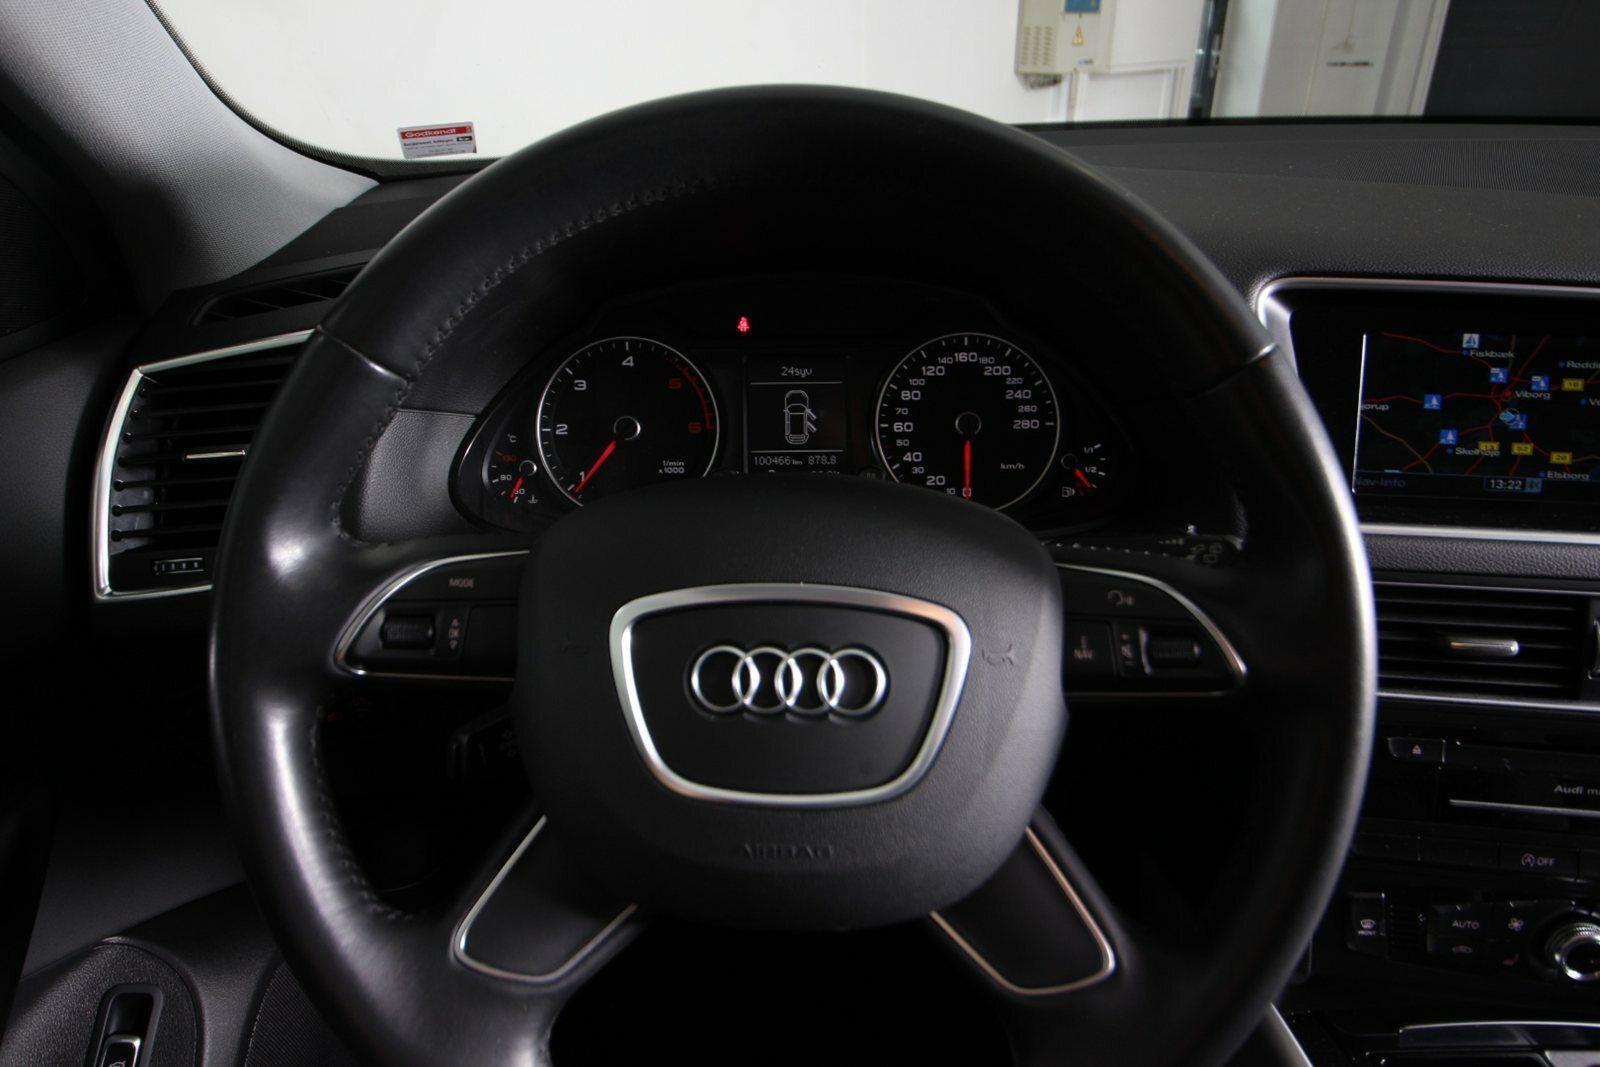 Audi Q5 TDi 258 S-line quat. S-tr. Van